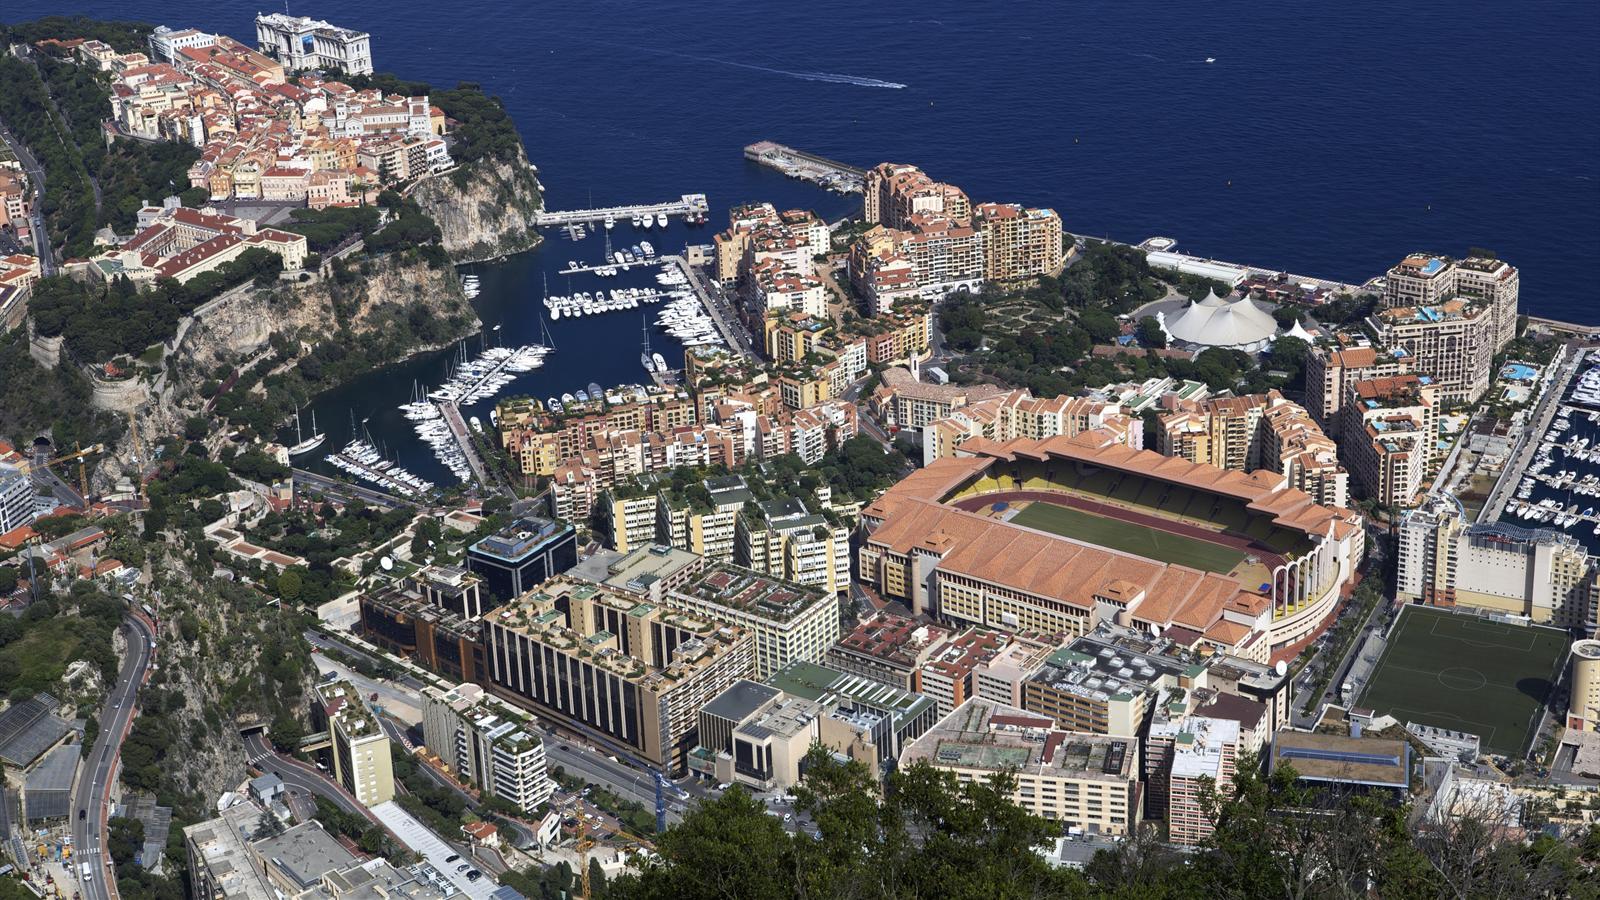 As Monaco Tabelle